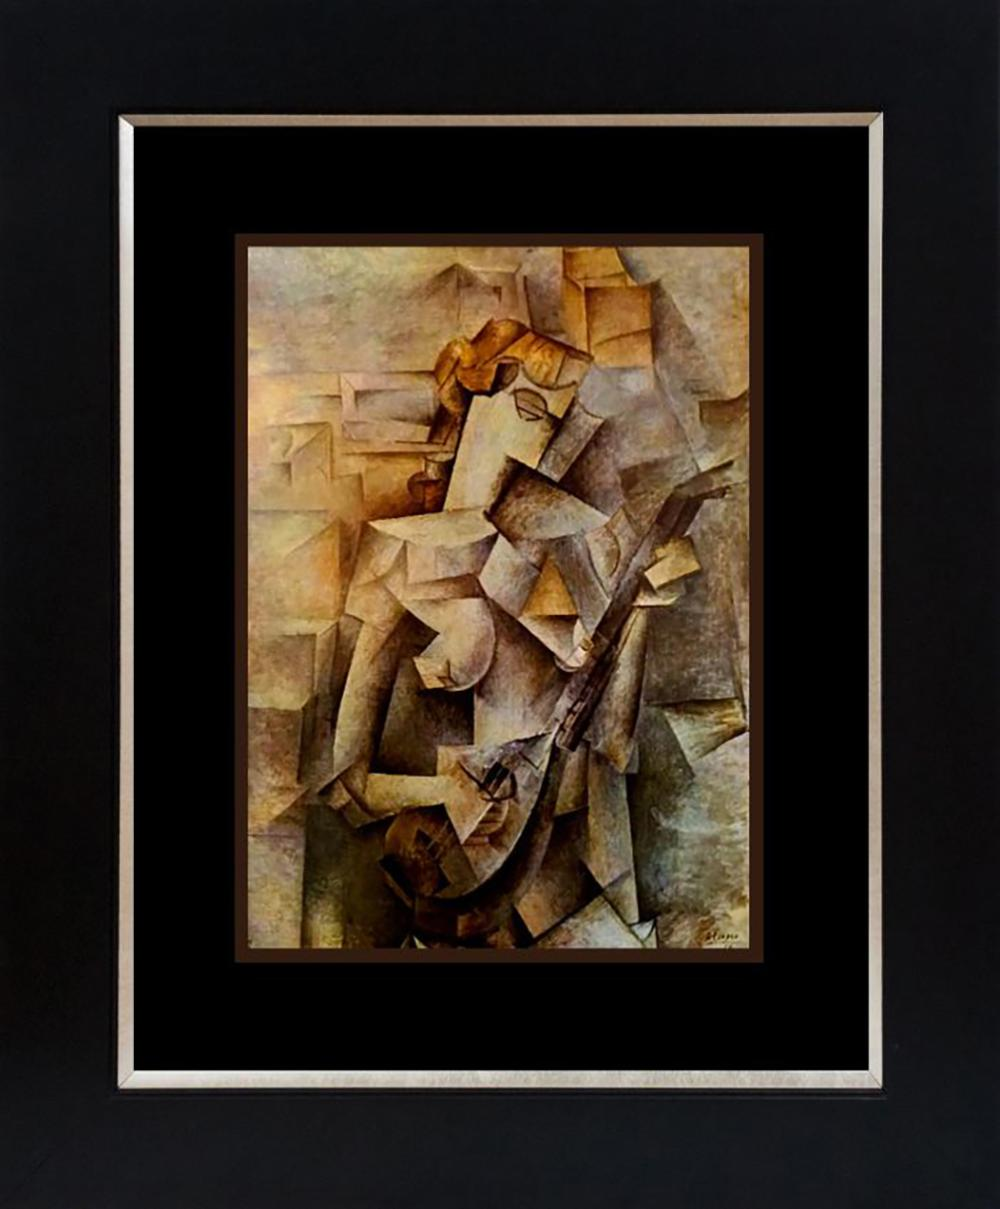 Pablo Picasso Color Plate Lithograph